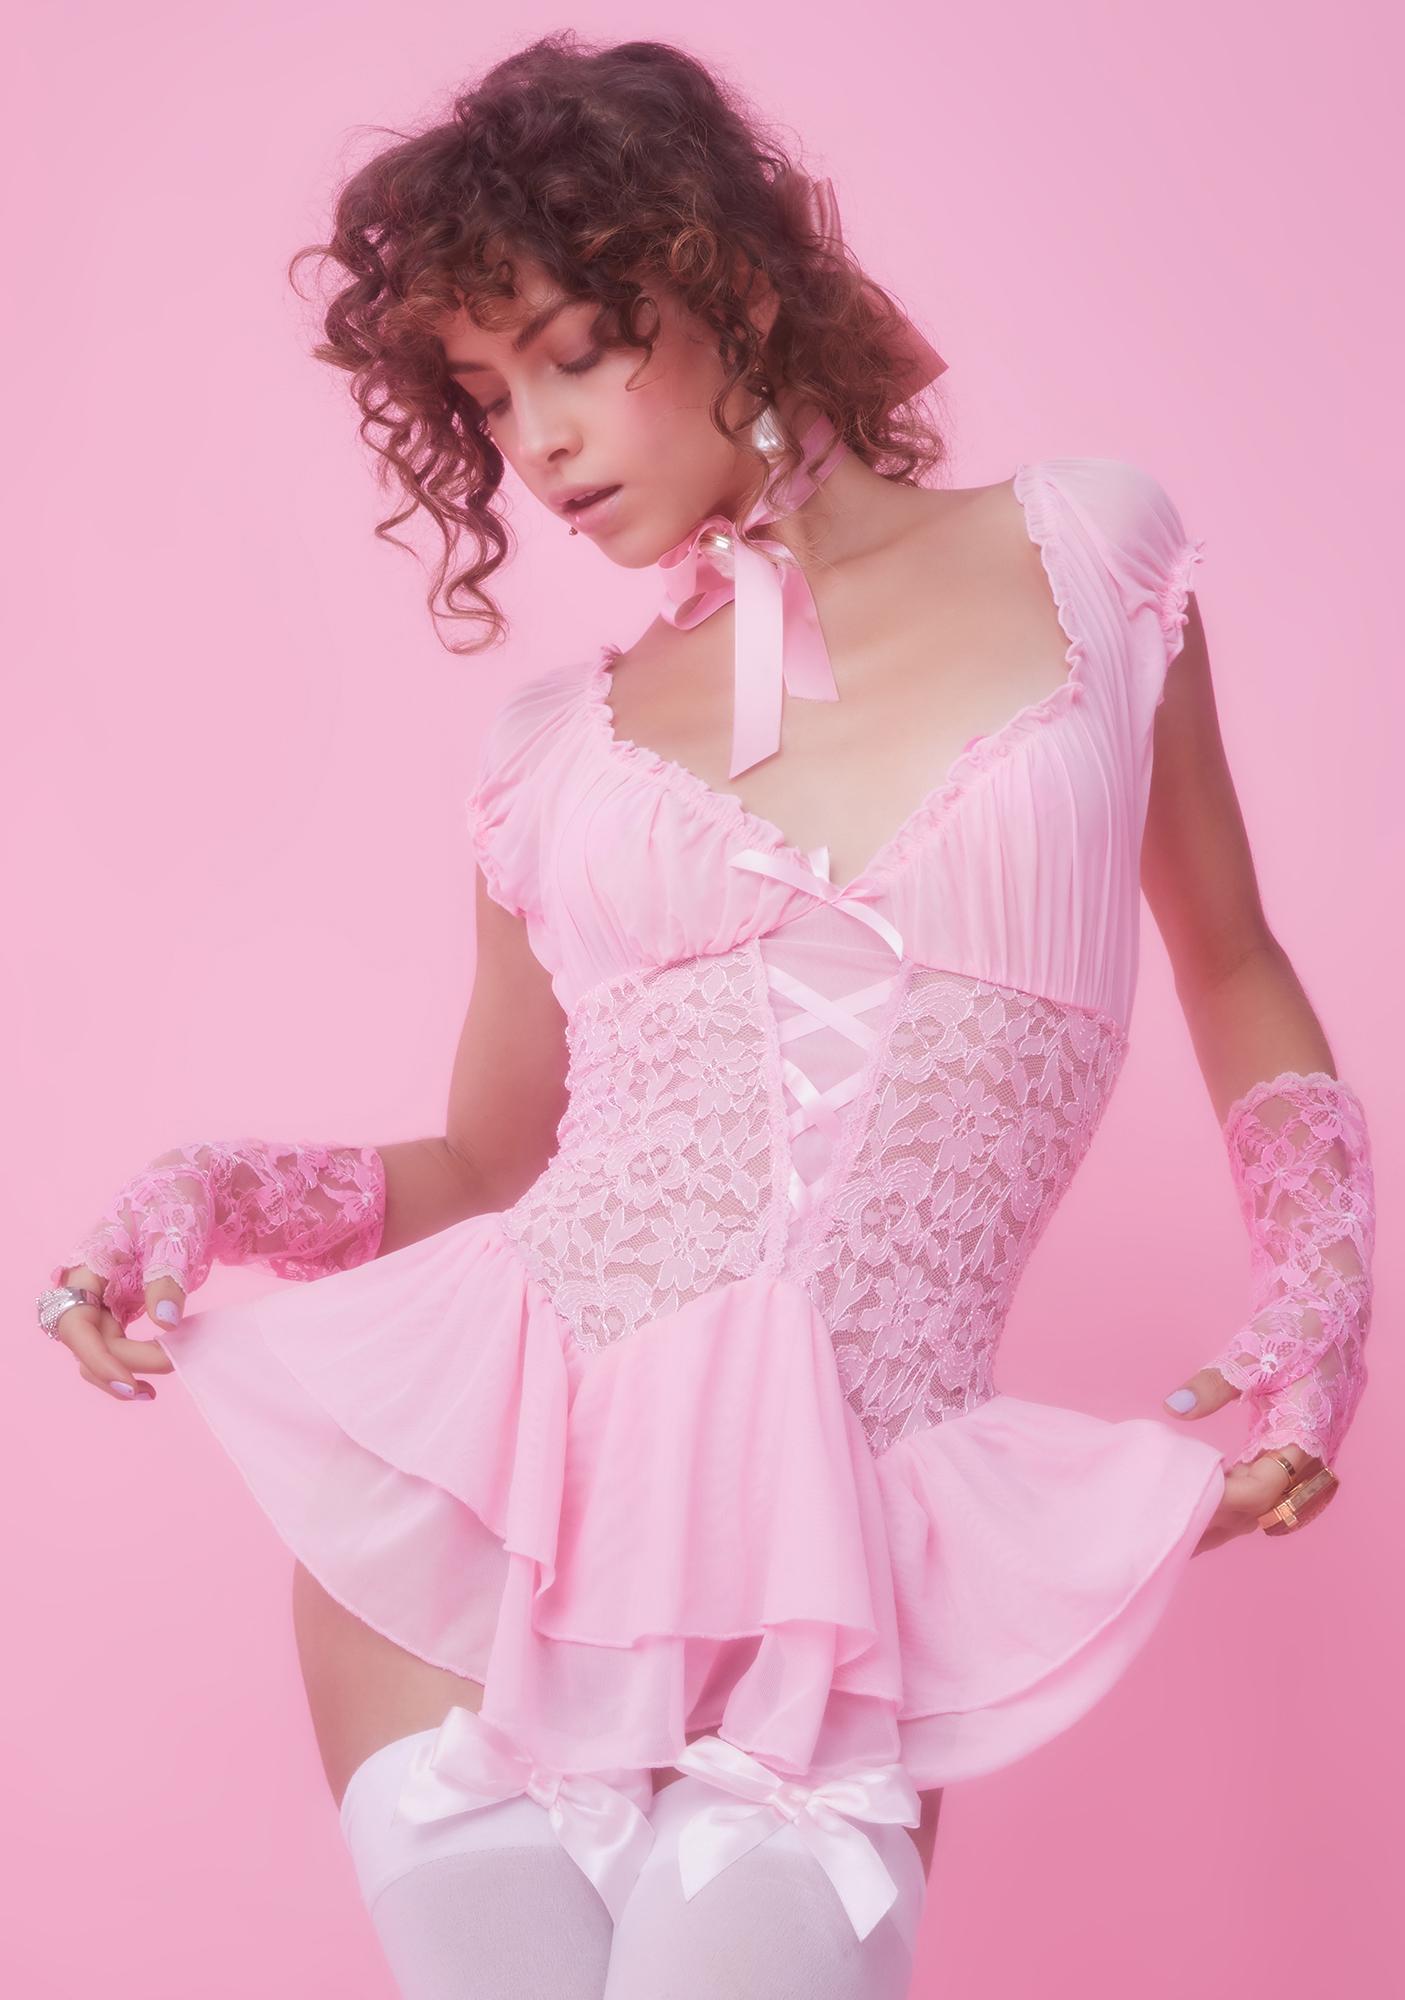 Sugar Thrillz Where's My Slipper Lace Teddy